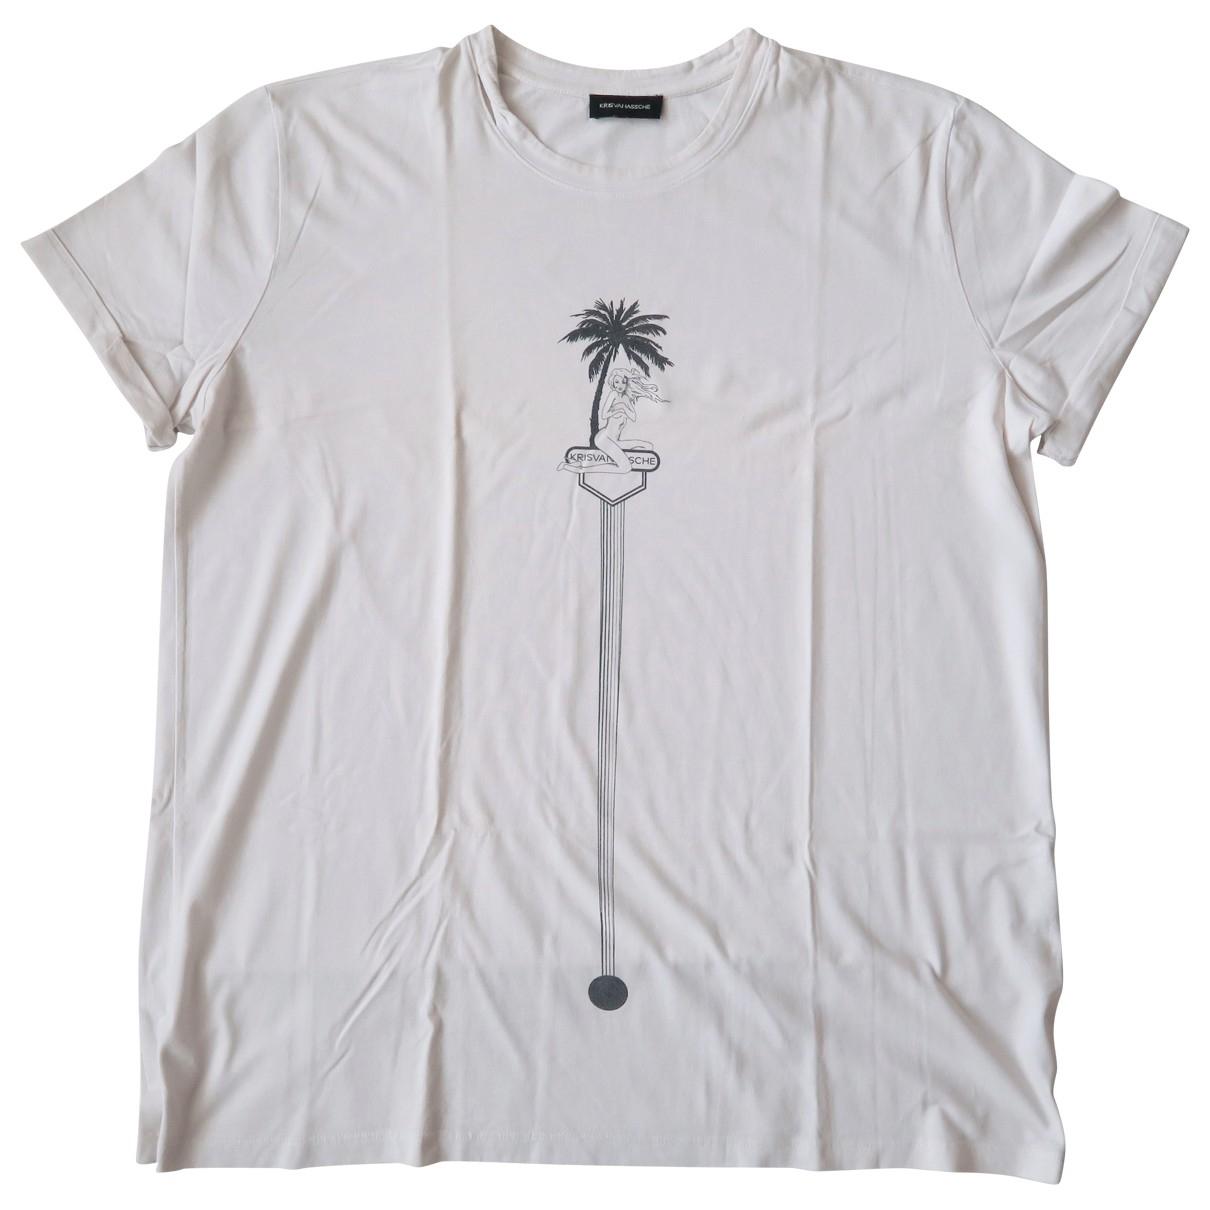 Kris Van Assche \N T-Shirts in  Weiss Baumwolle